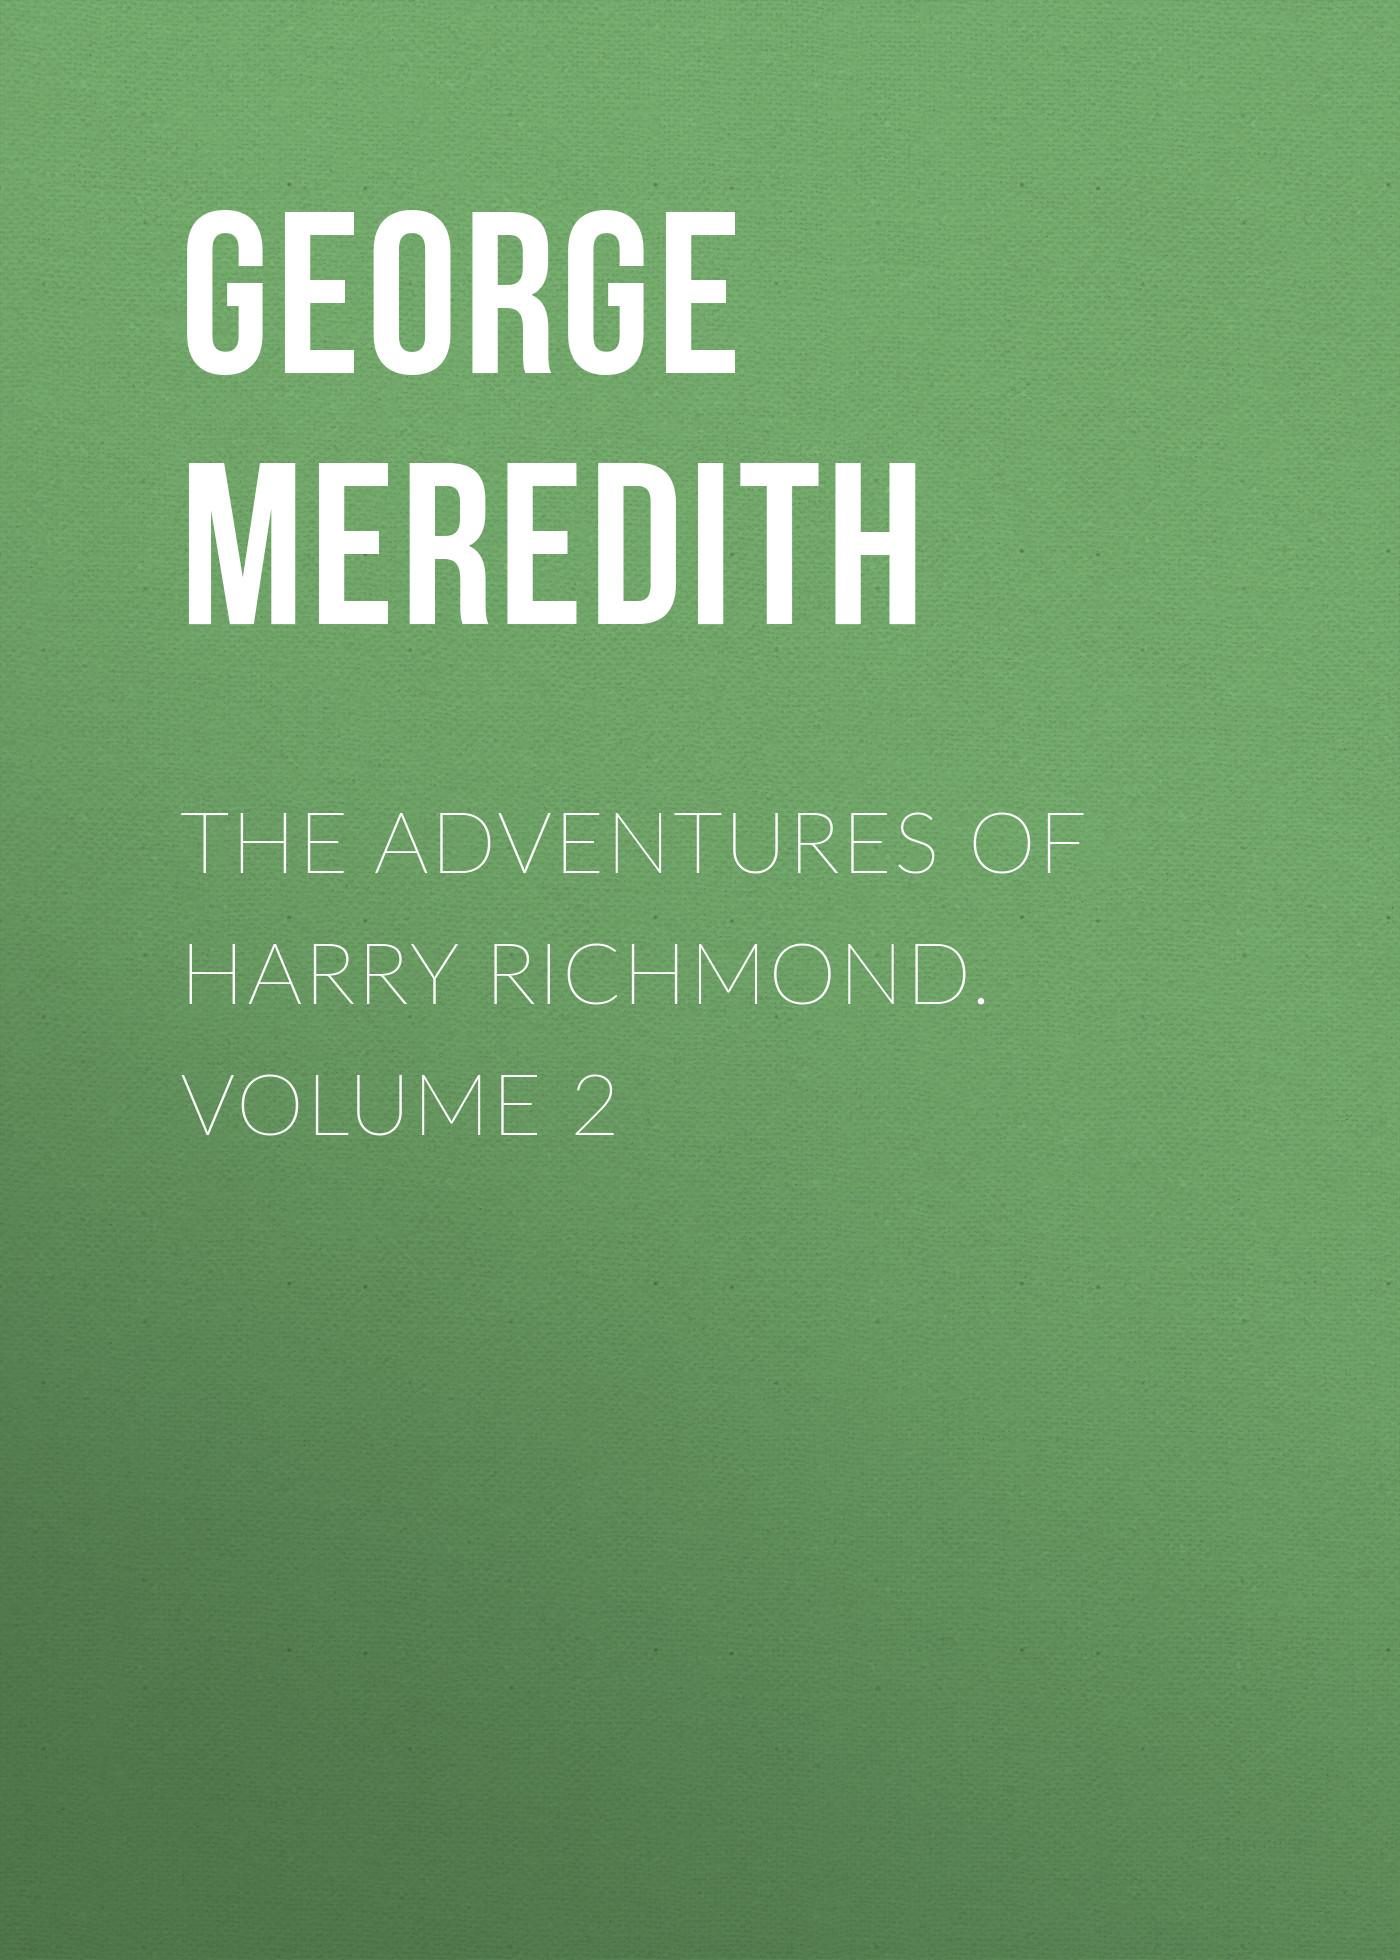 George Meredith The Adventures of Harry Richmond. Volume 2 sala george augustus the strange adventures of captain dangerous volume 1